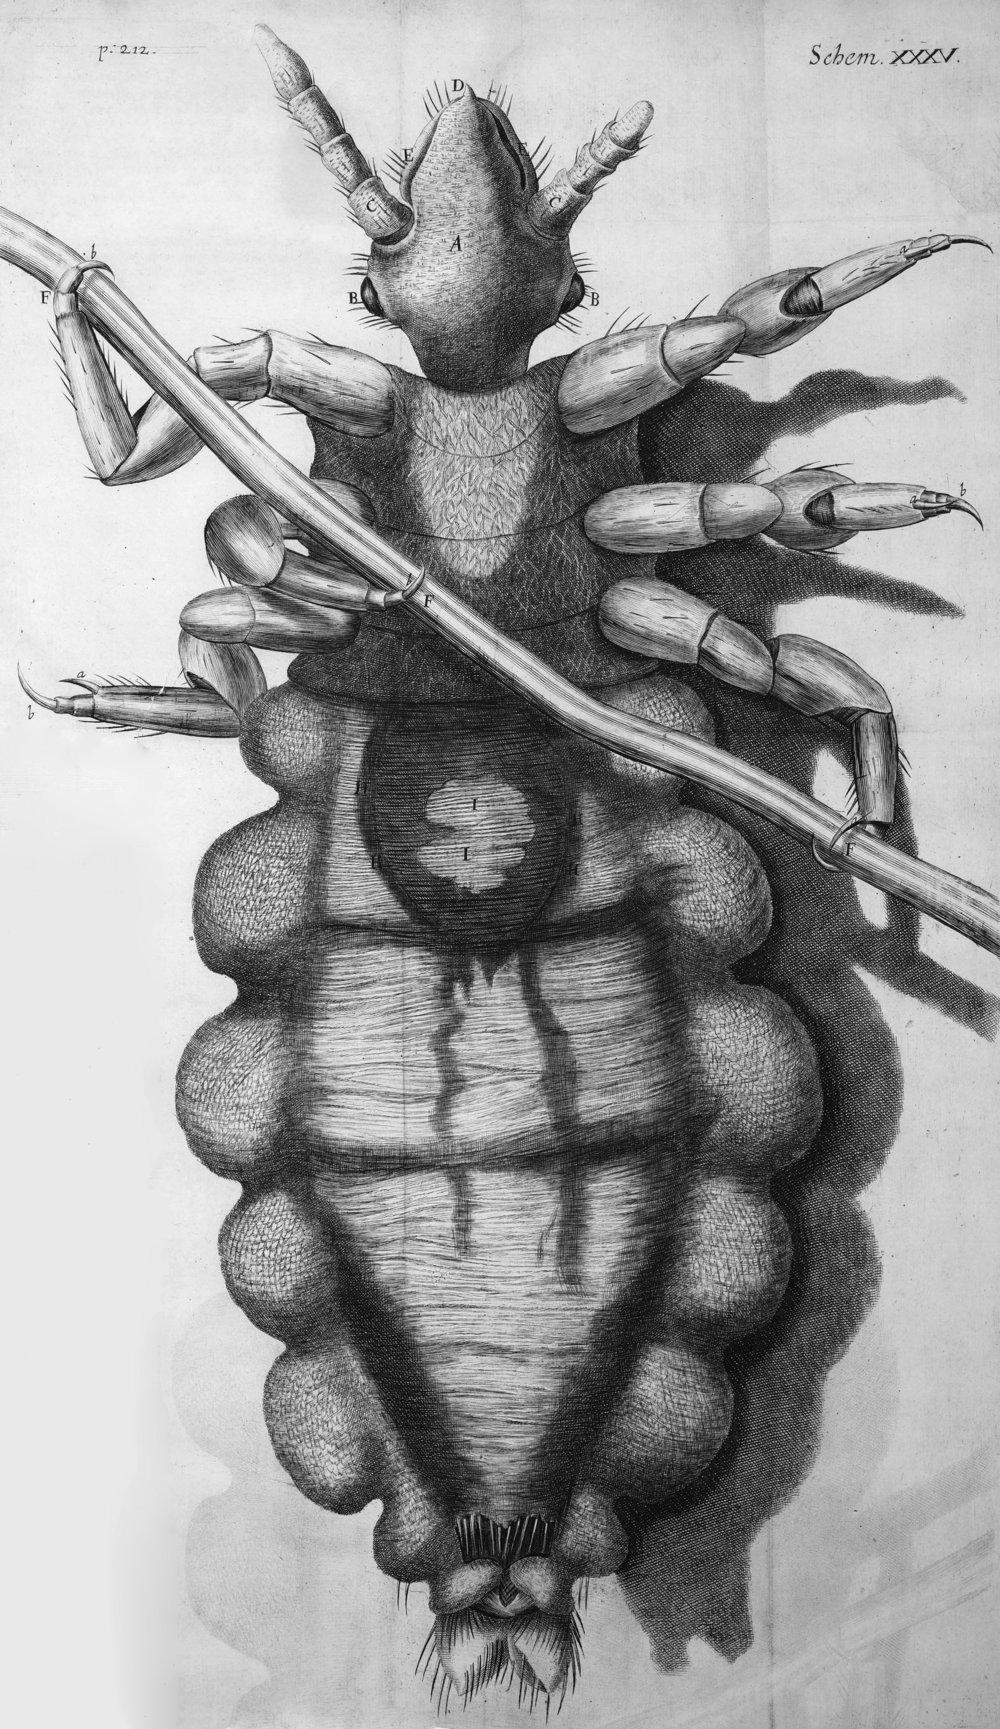 Louse_diagram,_Micrographia,_Robert_Hooke,_1667.jpg